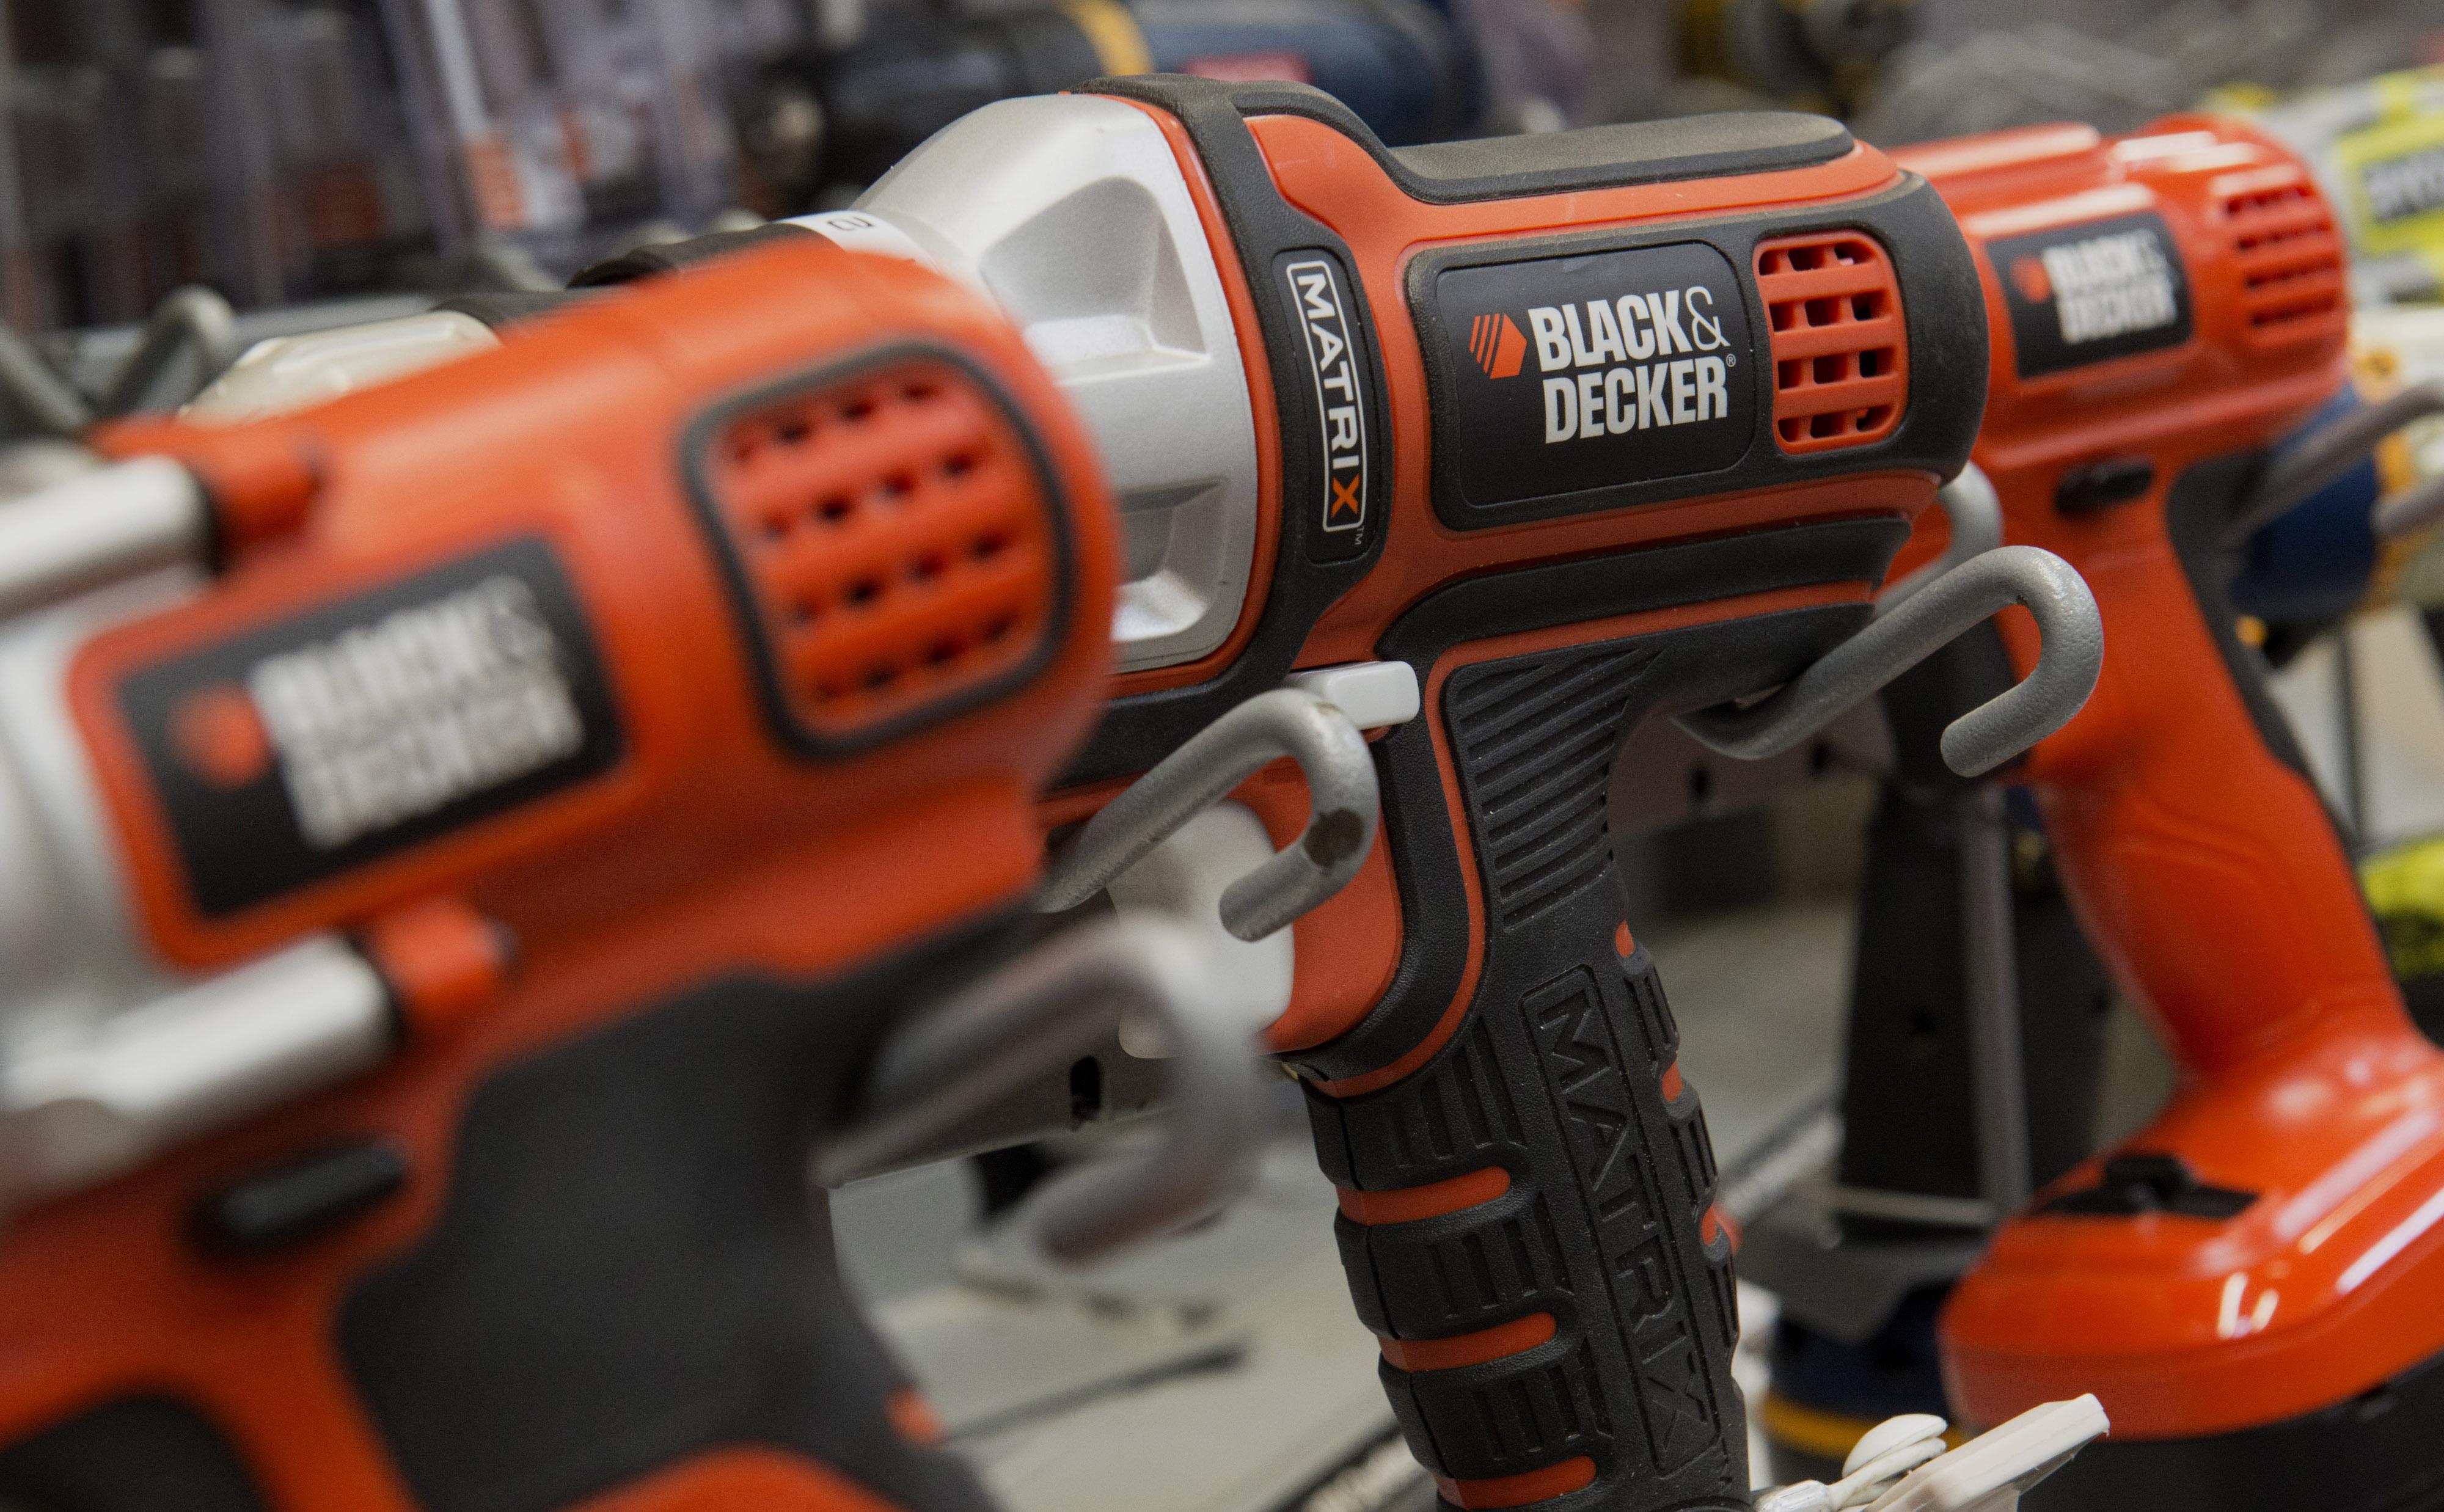 Stanley Black & Decker  tools